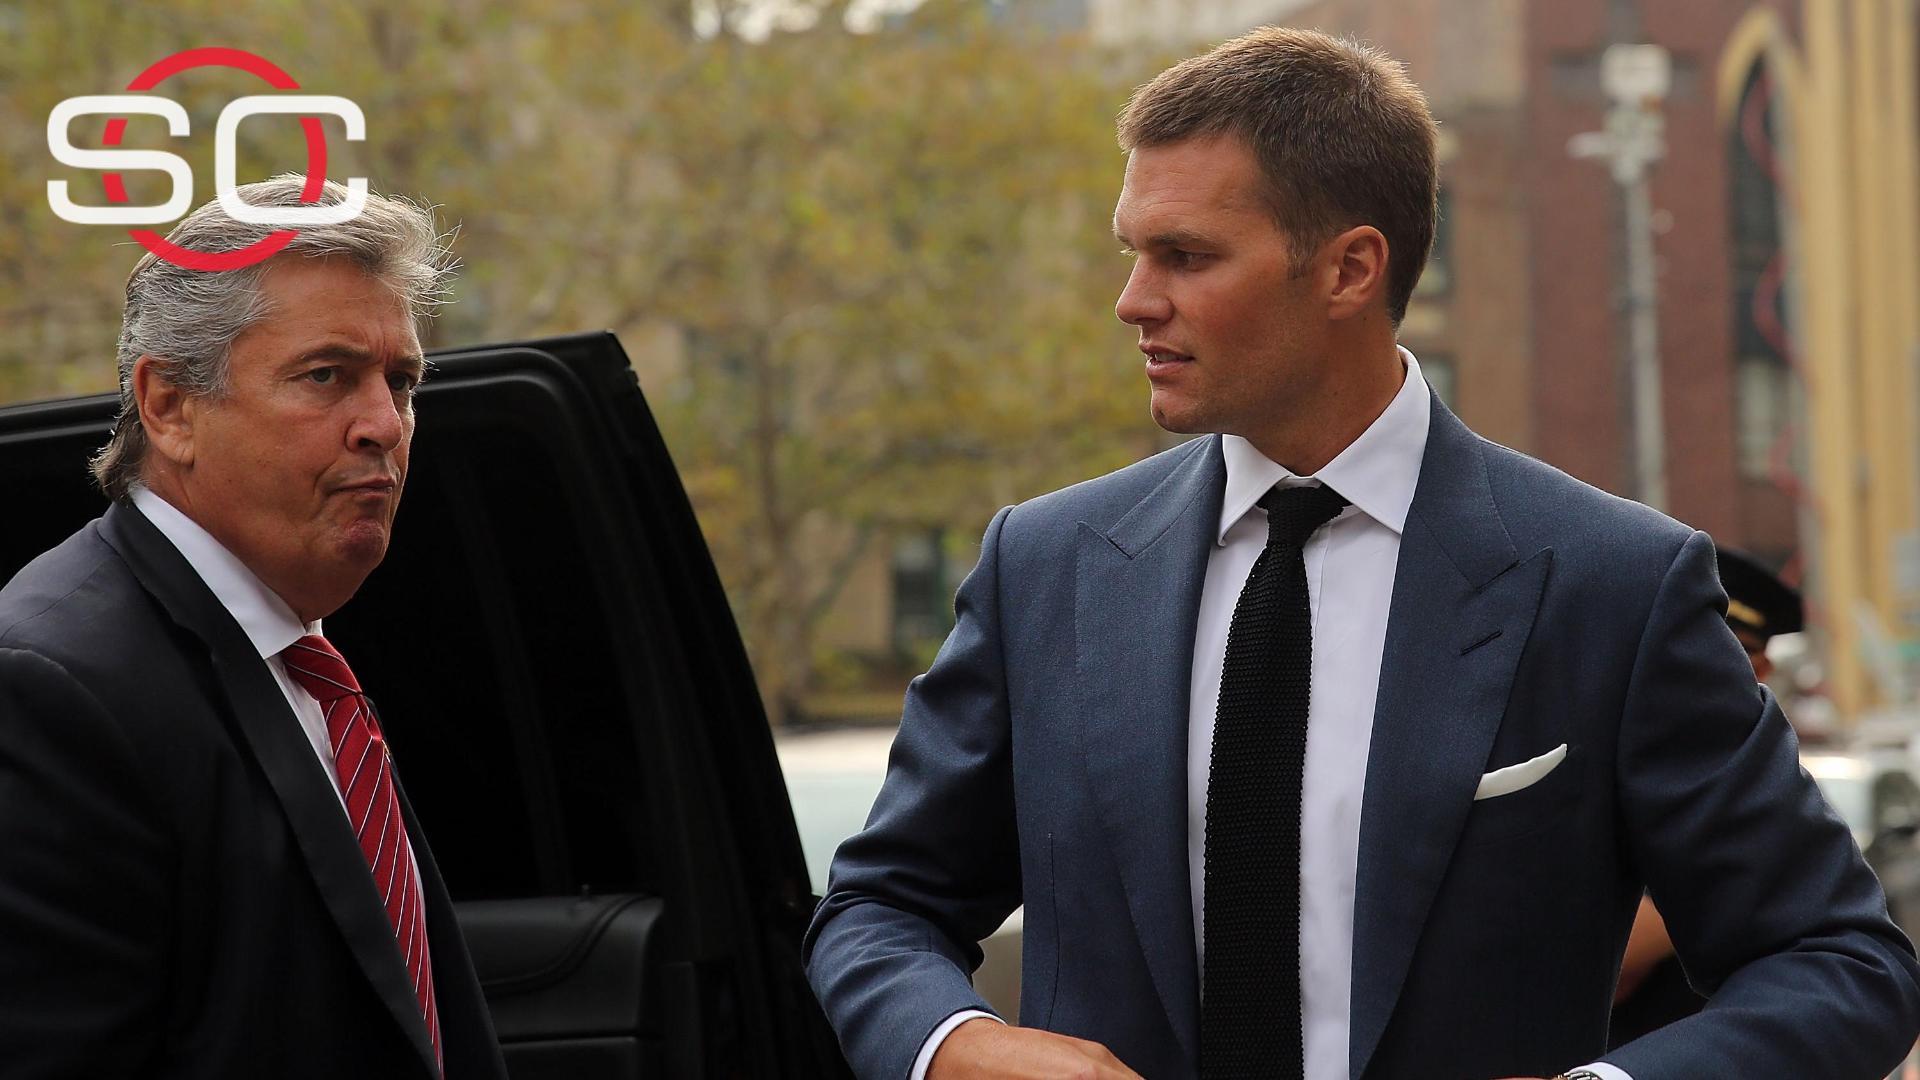 Did Judge Berman make the right decision in Brady's case?